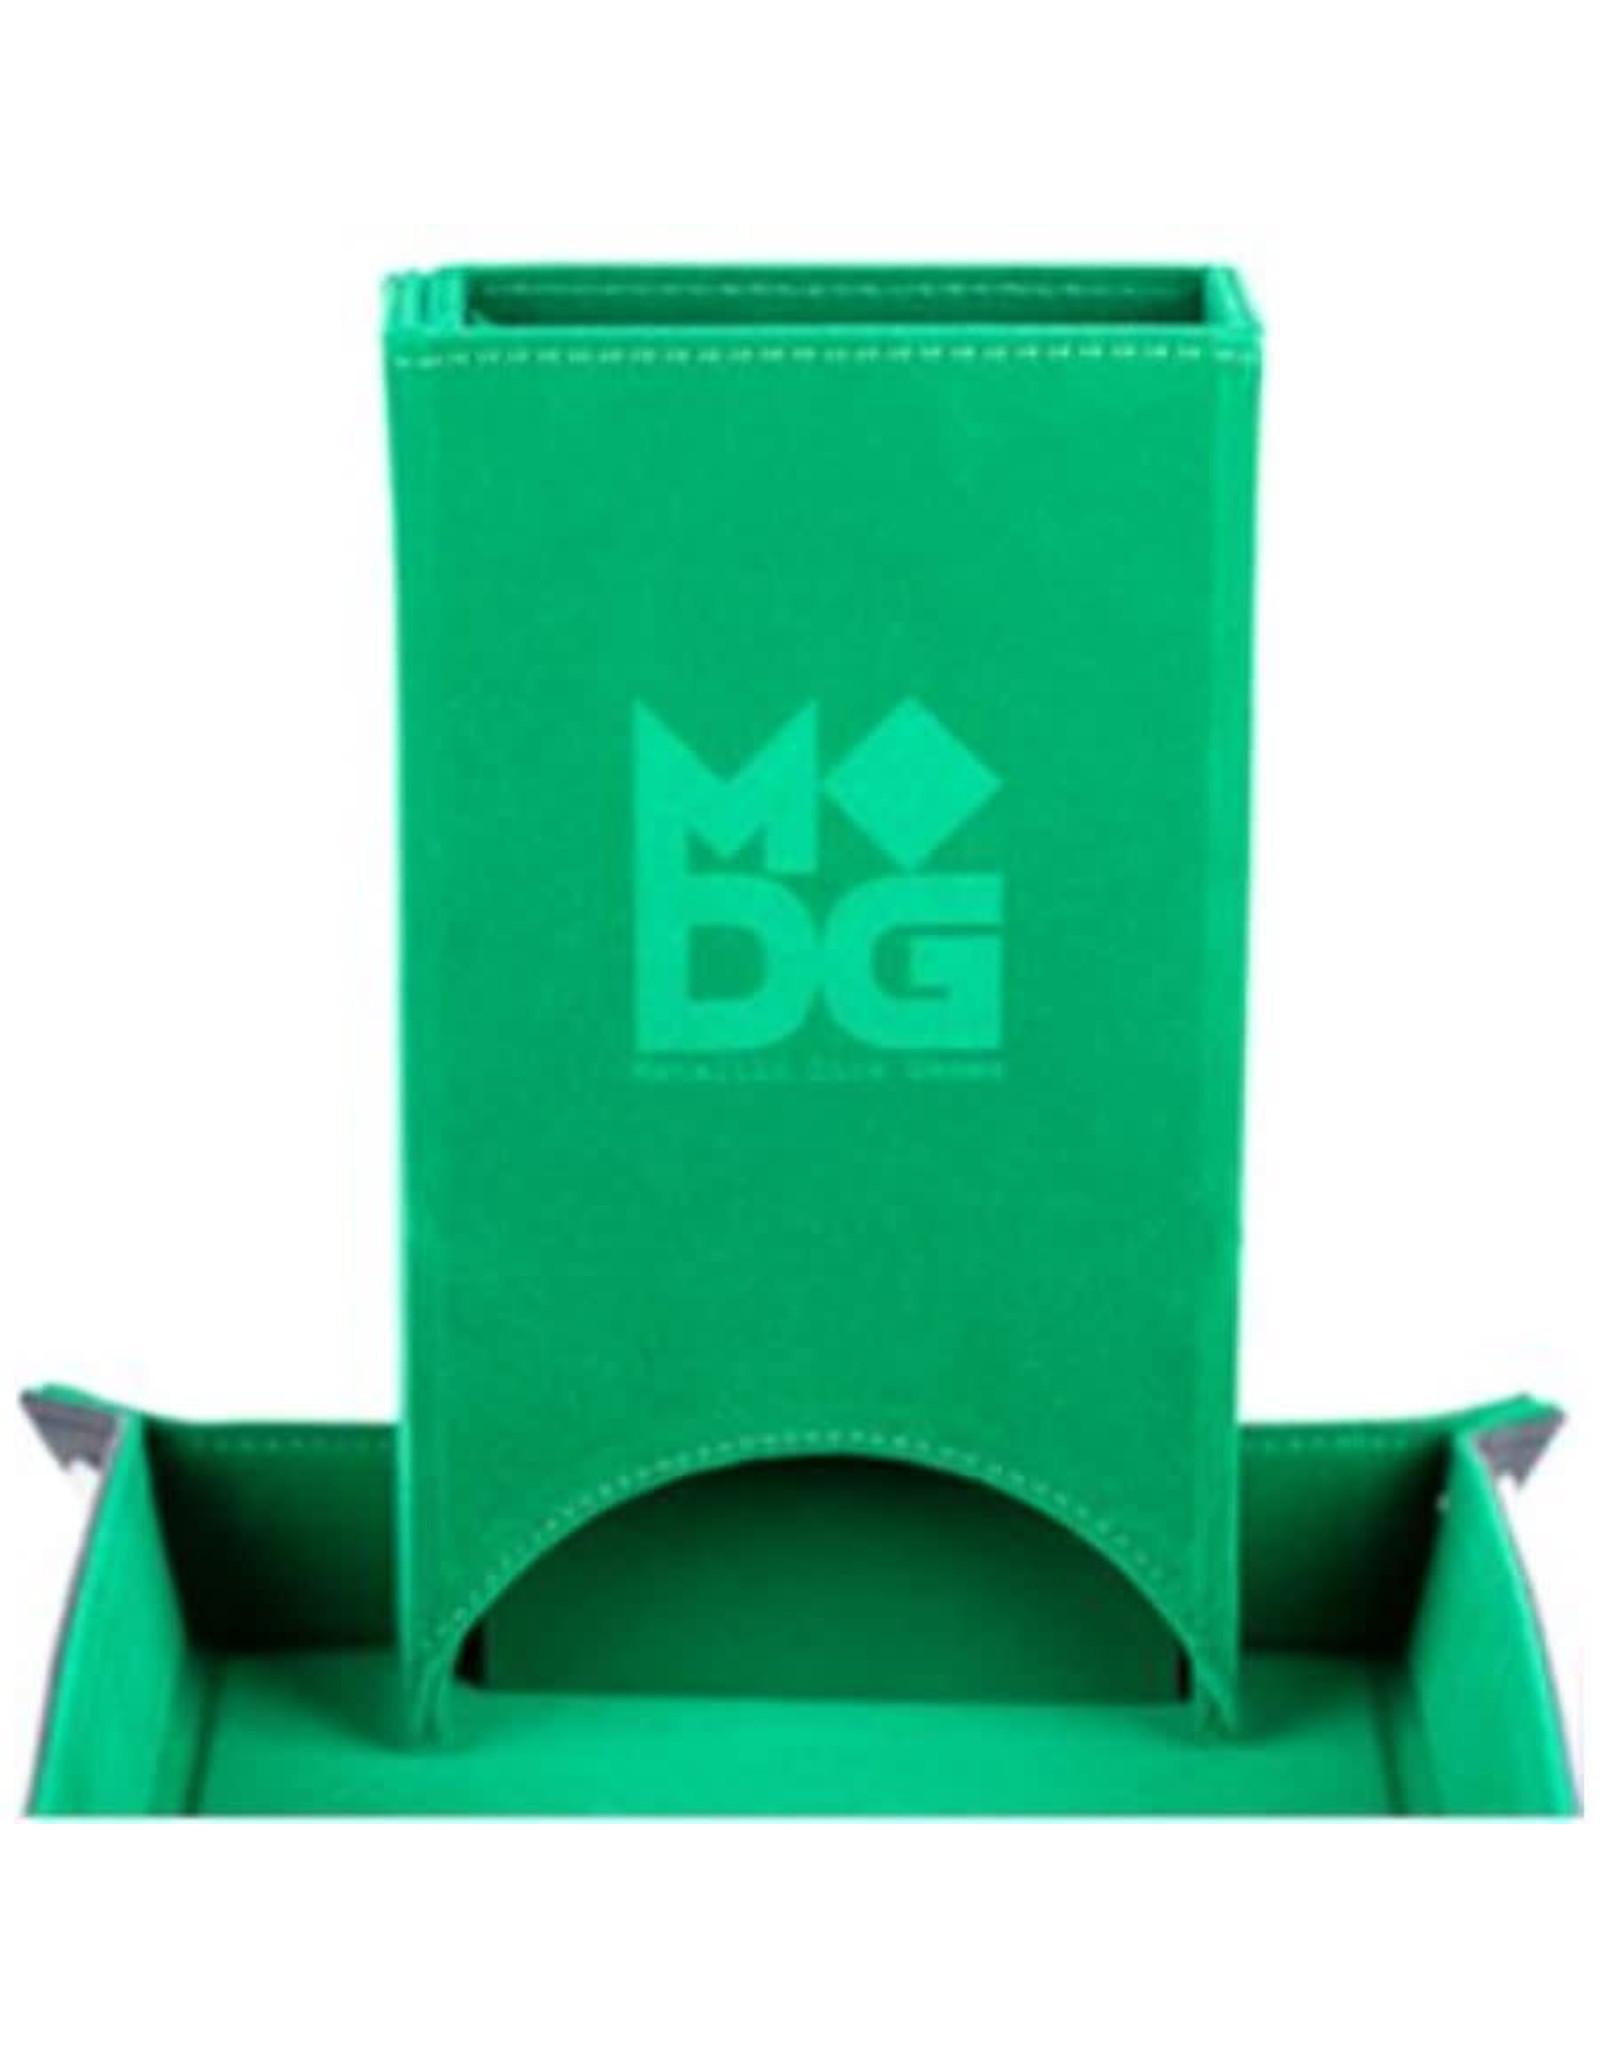 Metallic Dice Games Fold Up Velvet Dice Tower: Green